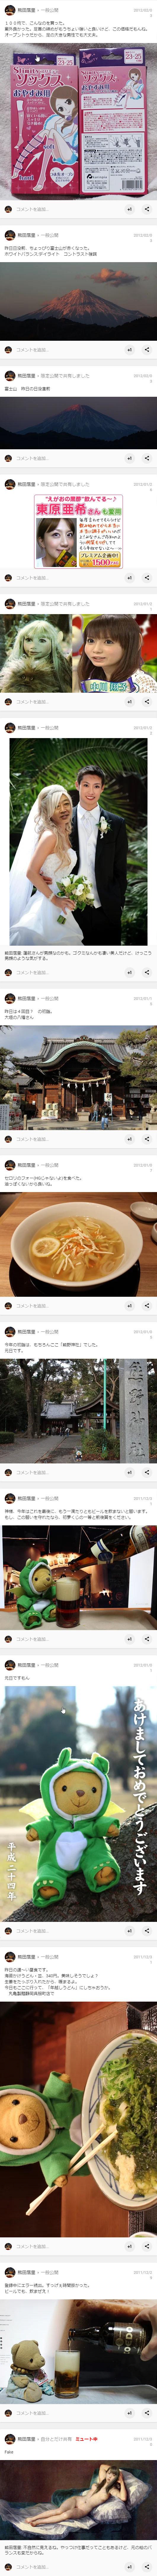 Google+ 全投稿a